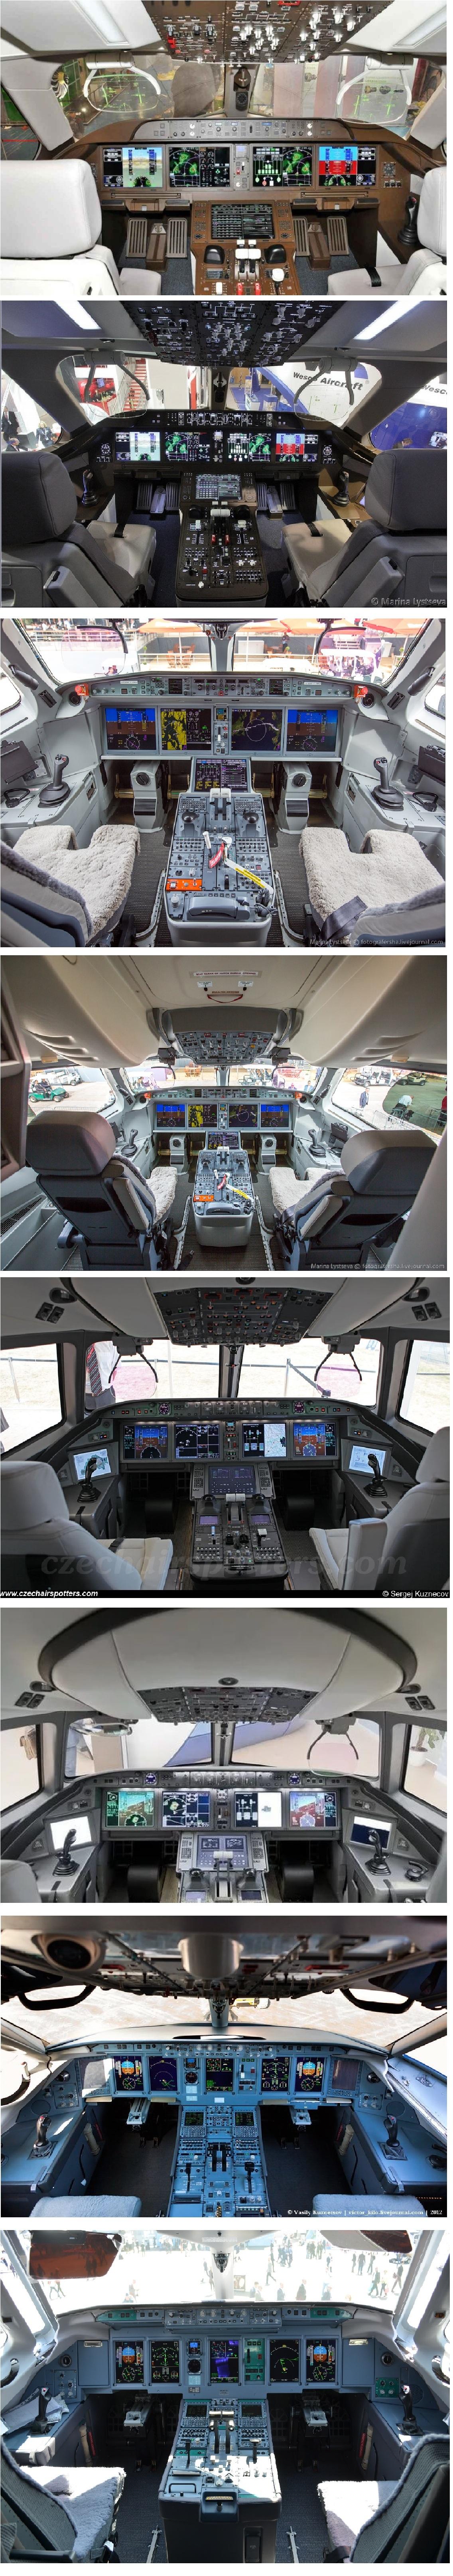 cockpits.jpg